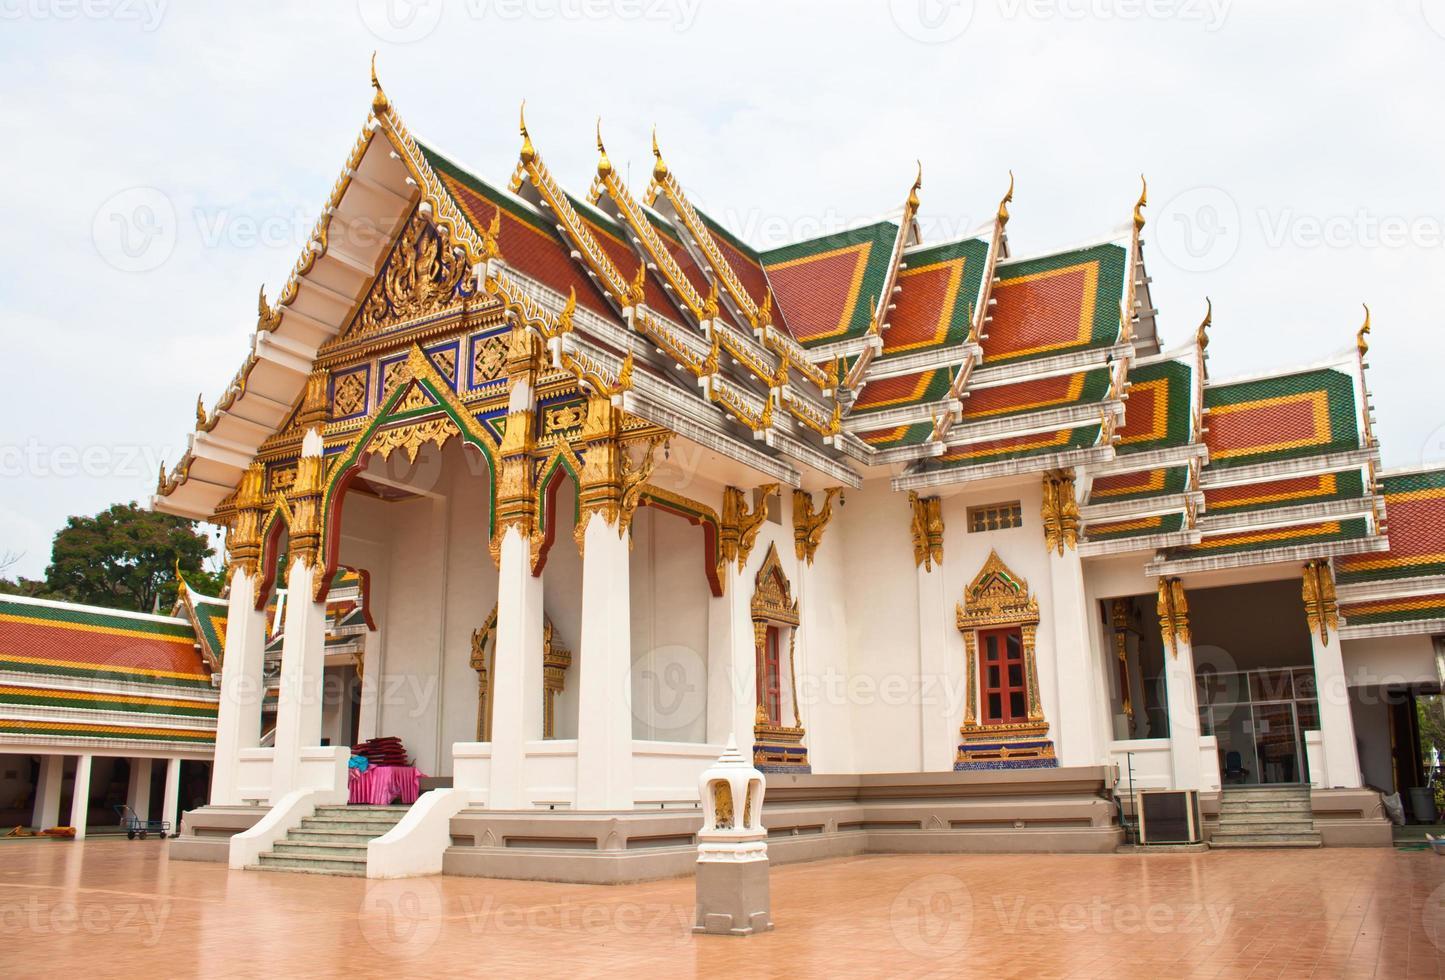 tempio di marmo, bangkok, thailandia foto